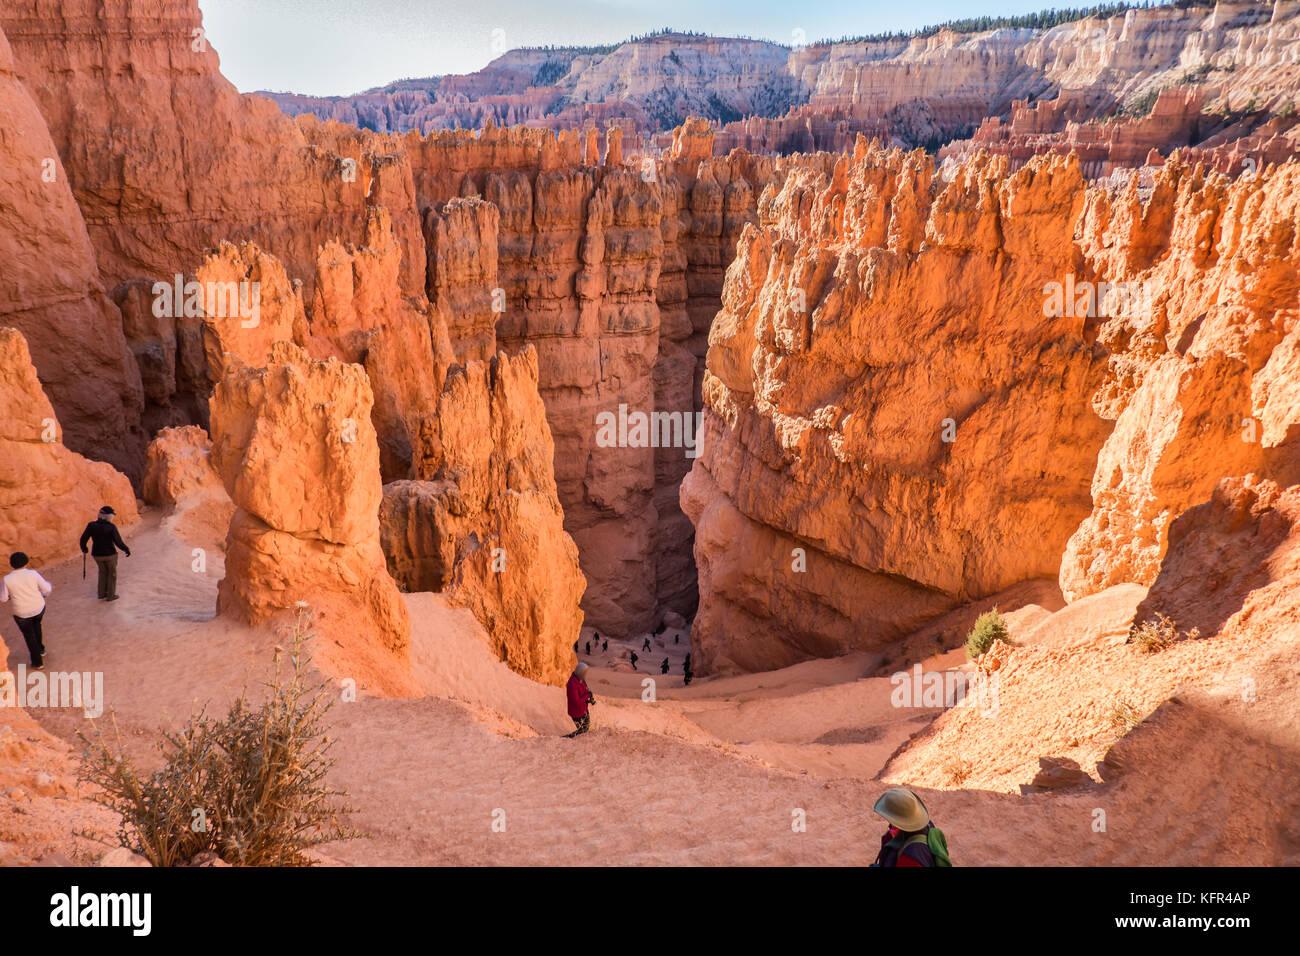 Bryce Canyon jusqu'à Wall Street dans l'Utah, aux Etats-Unis Photo Stock